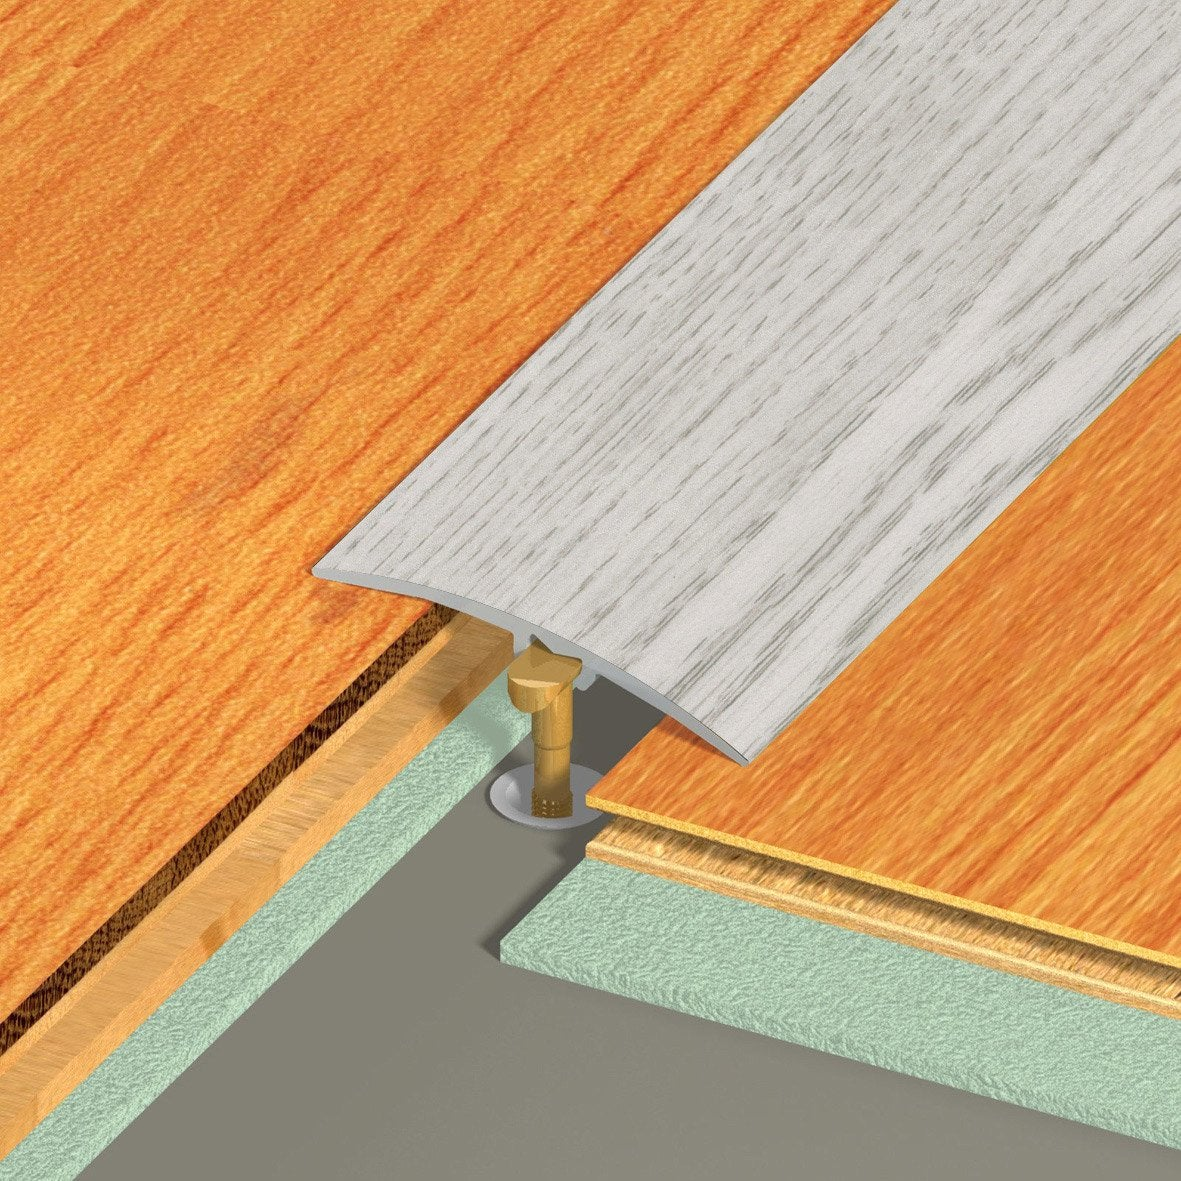 Barre de seuil multi niveaux dinac d cor ch ne 4 1 x 270 - Barre de seuil bois ...